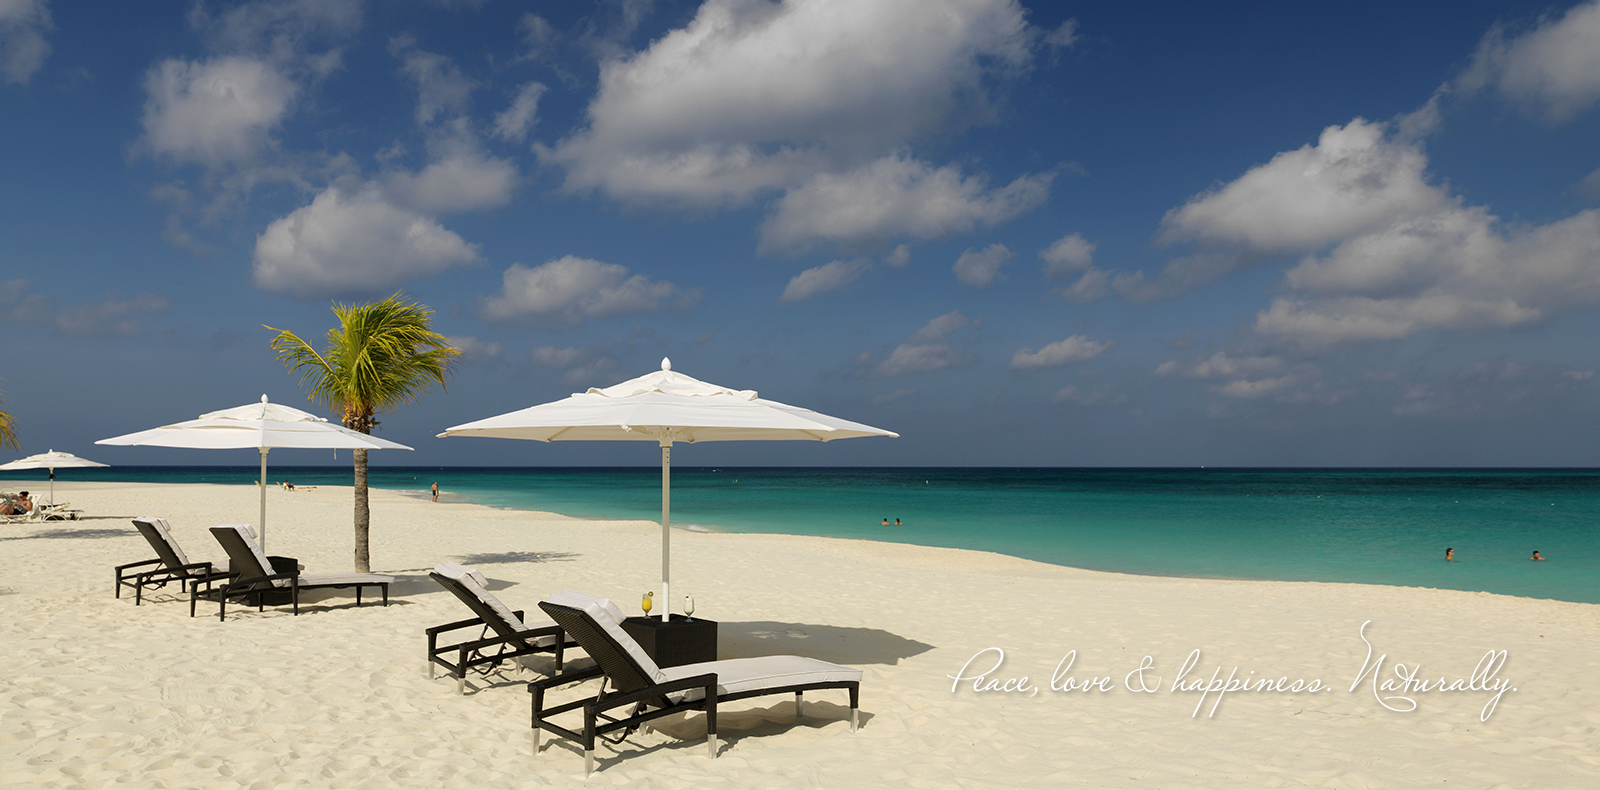 Aruba Romantic Resort u0026 Hotel Bucuti